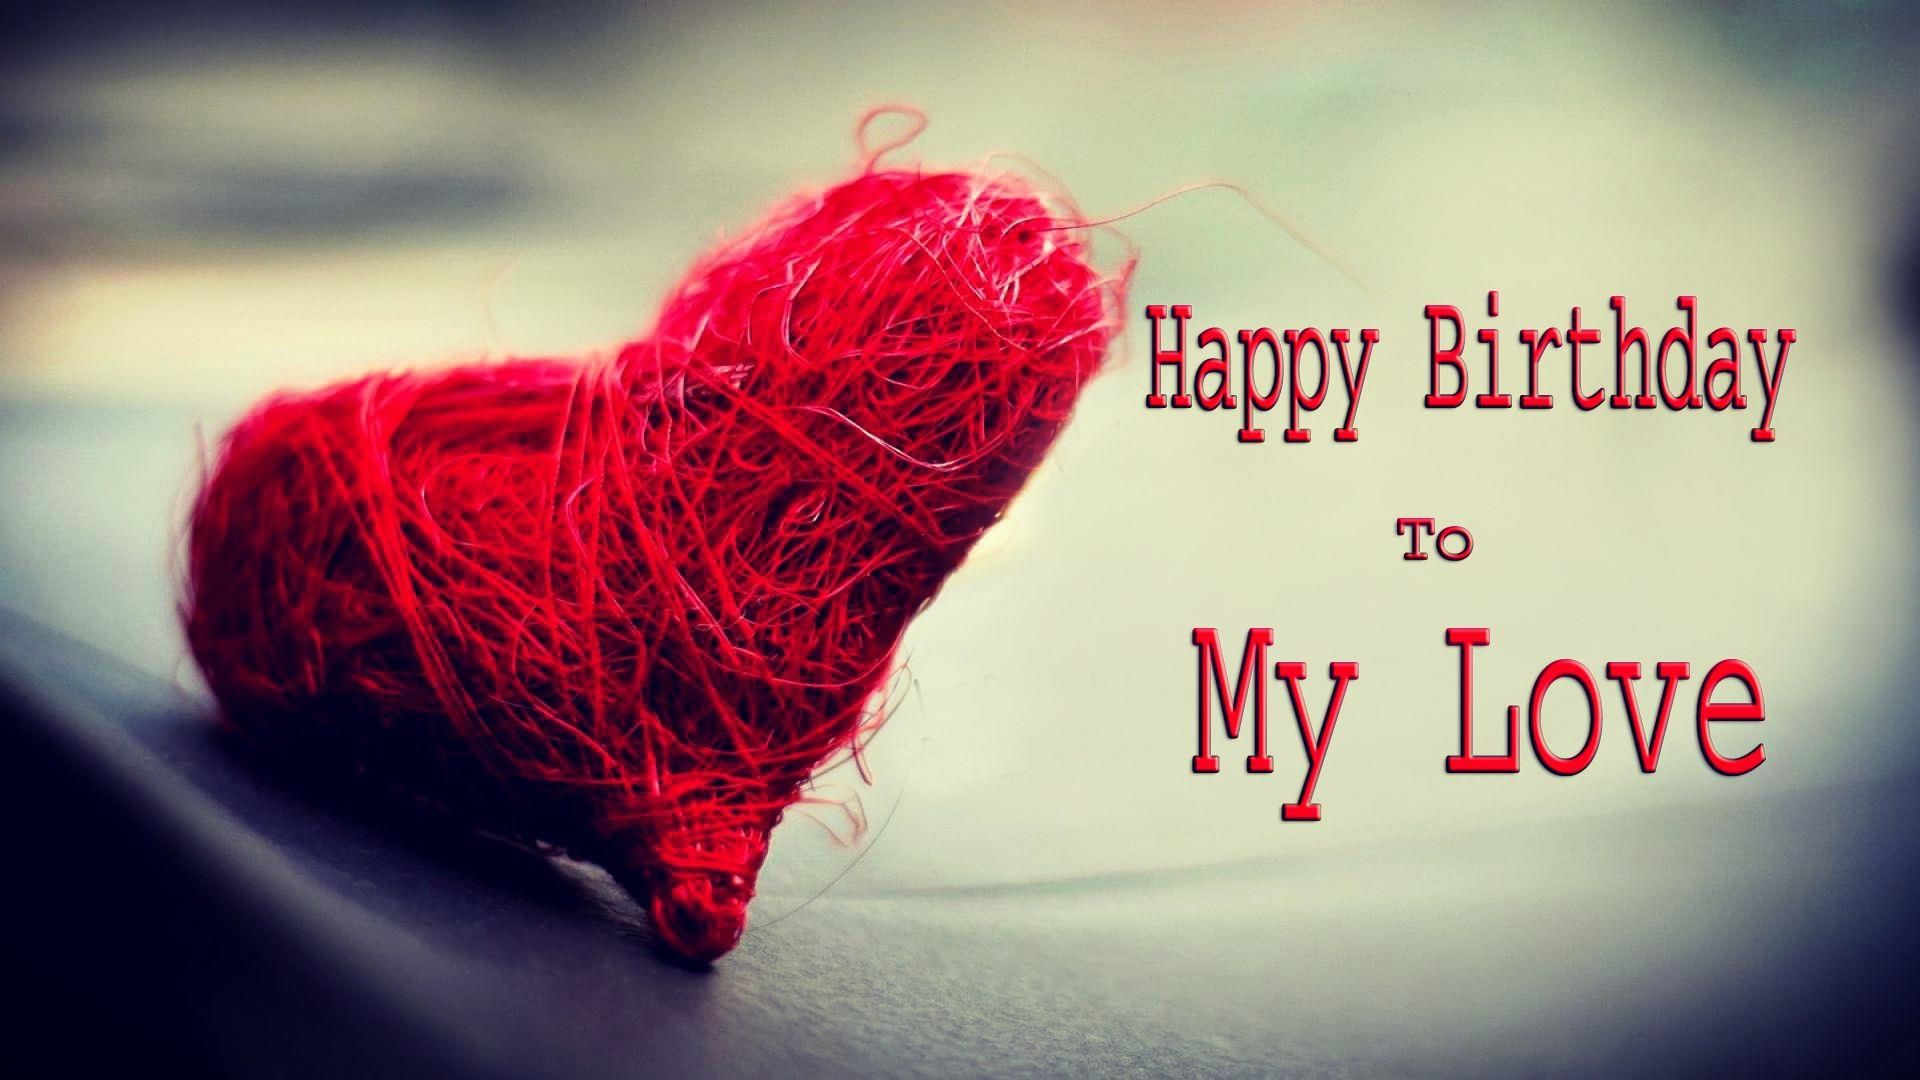 LOVE POEM FOR HAPPY BIRTHDAY